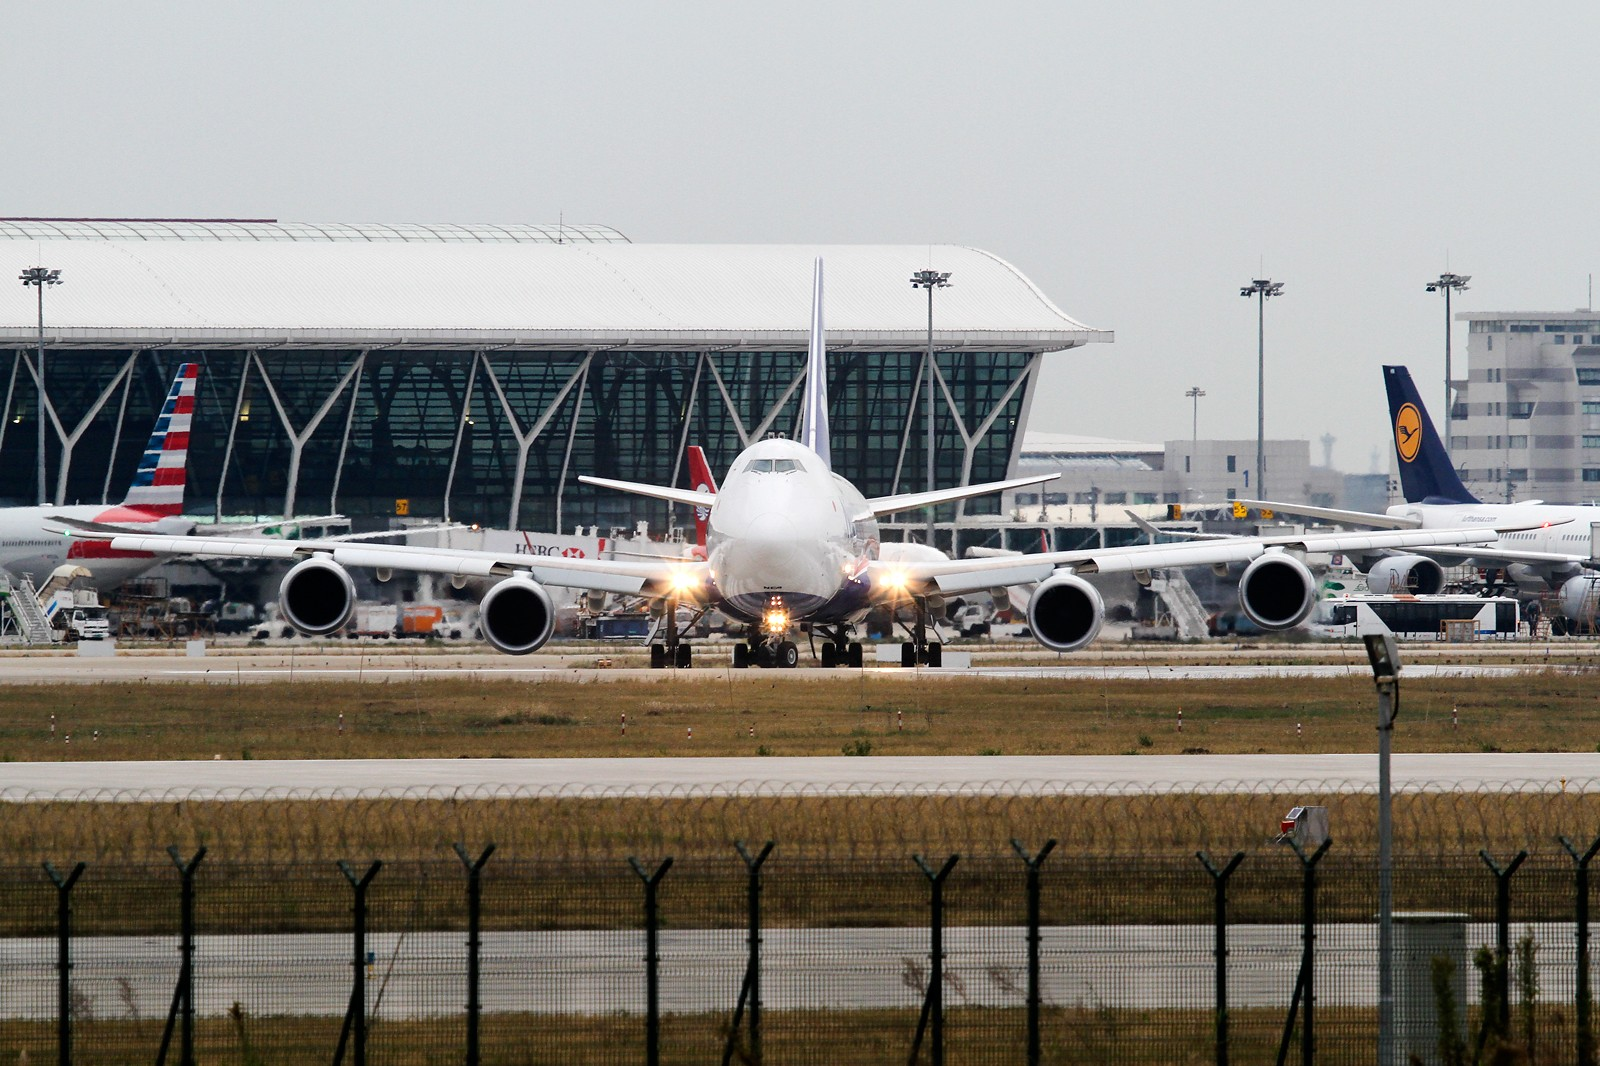 Re:【SHA/PVG/NKG/HKG/PEK】***********2014年度总结*********** BOEING 747-8F JA13KZ 中国上海浦东国际机场